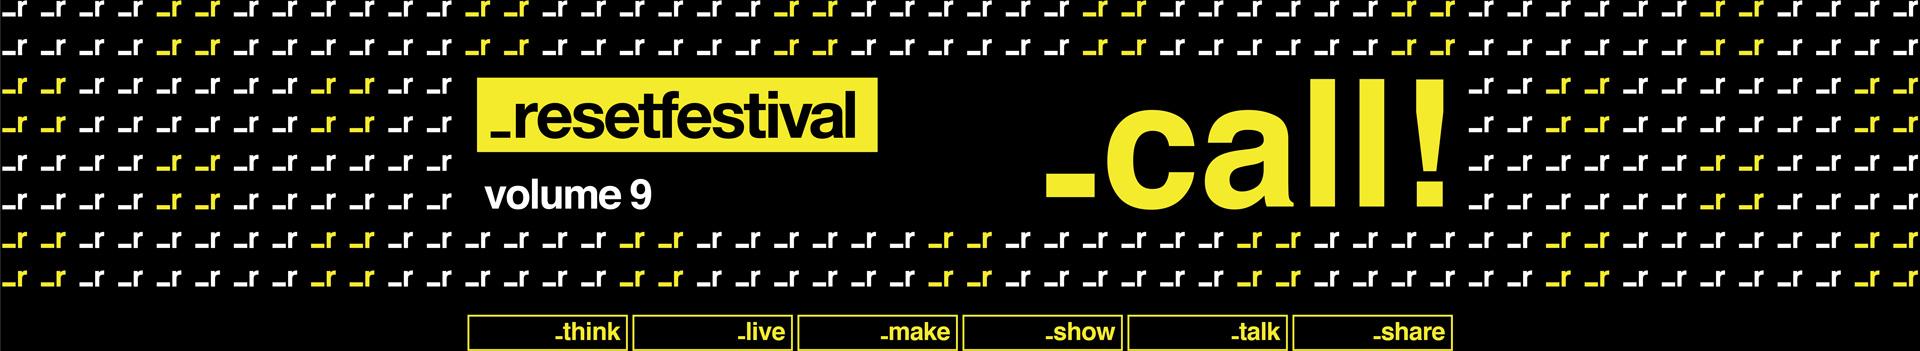 call_reset-festival-torino-2017